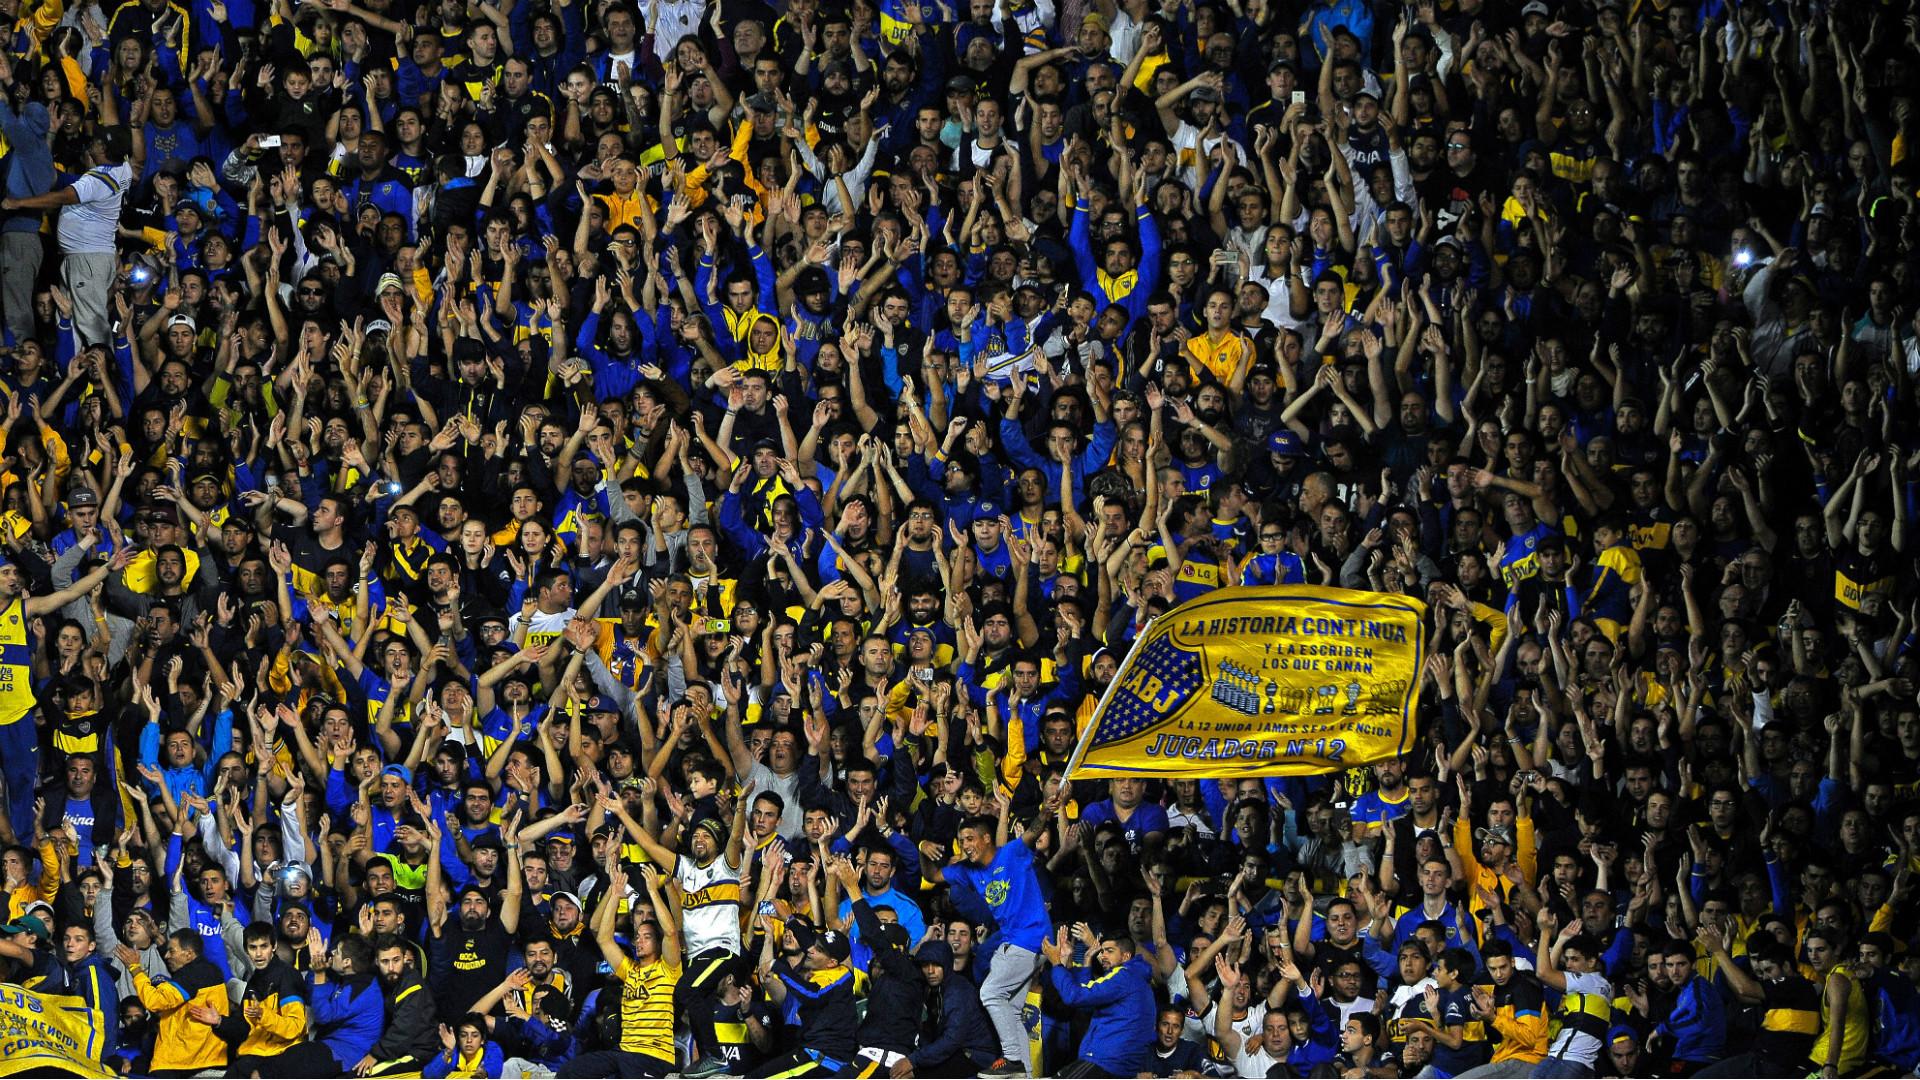 Hinchas Boca Patronato Campeonato Primera Division Fecha 20